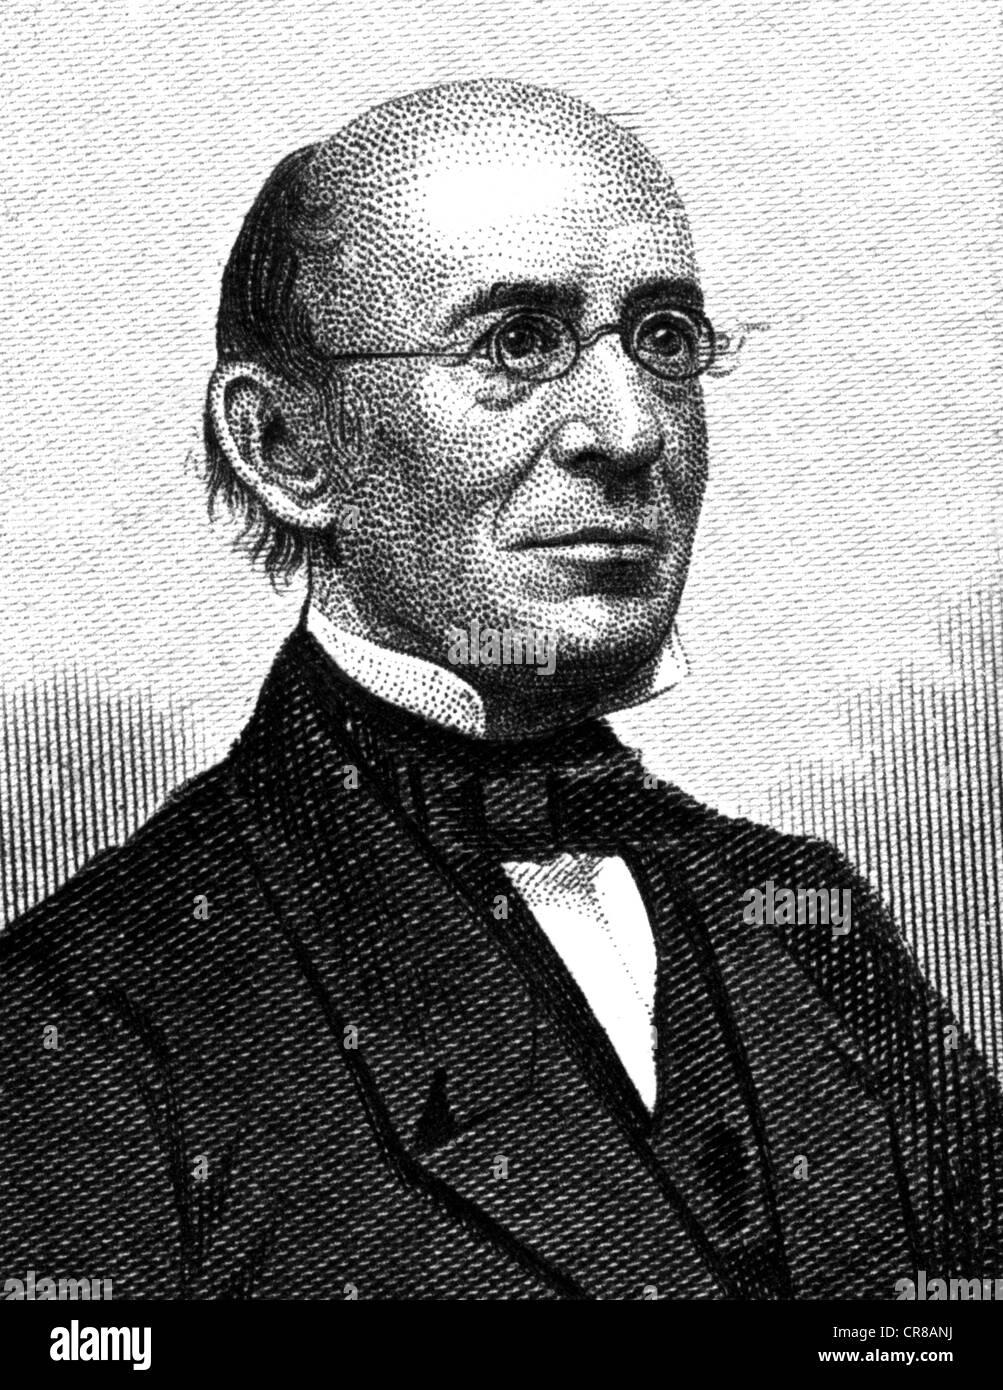 Garrison, William Lloyd, 10.12.1805 - 24.5.1879, American journalist and social reformer, portrait, steel engraving, - Stock Image